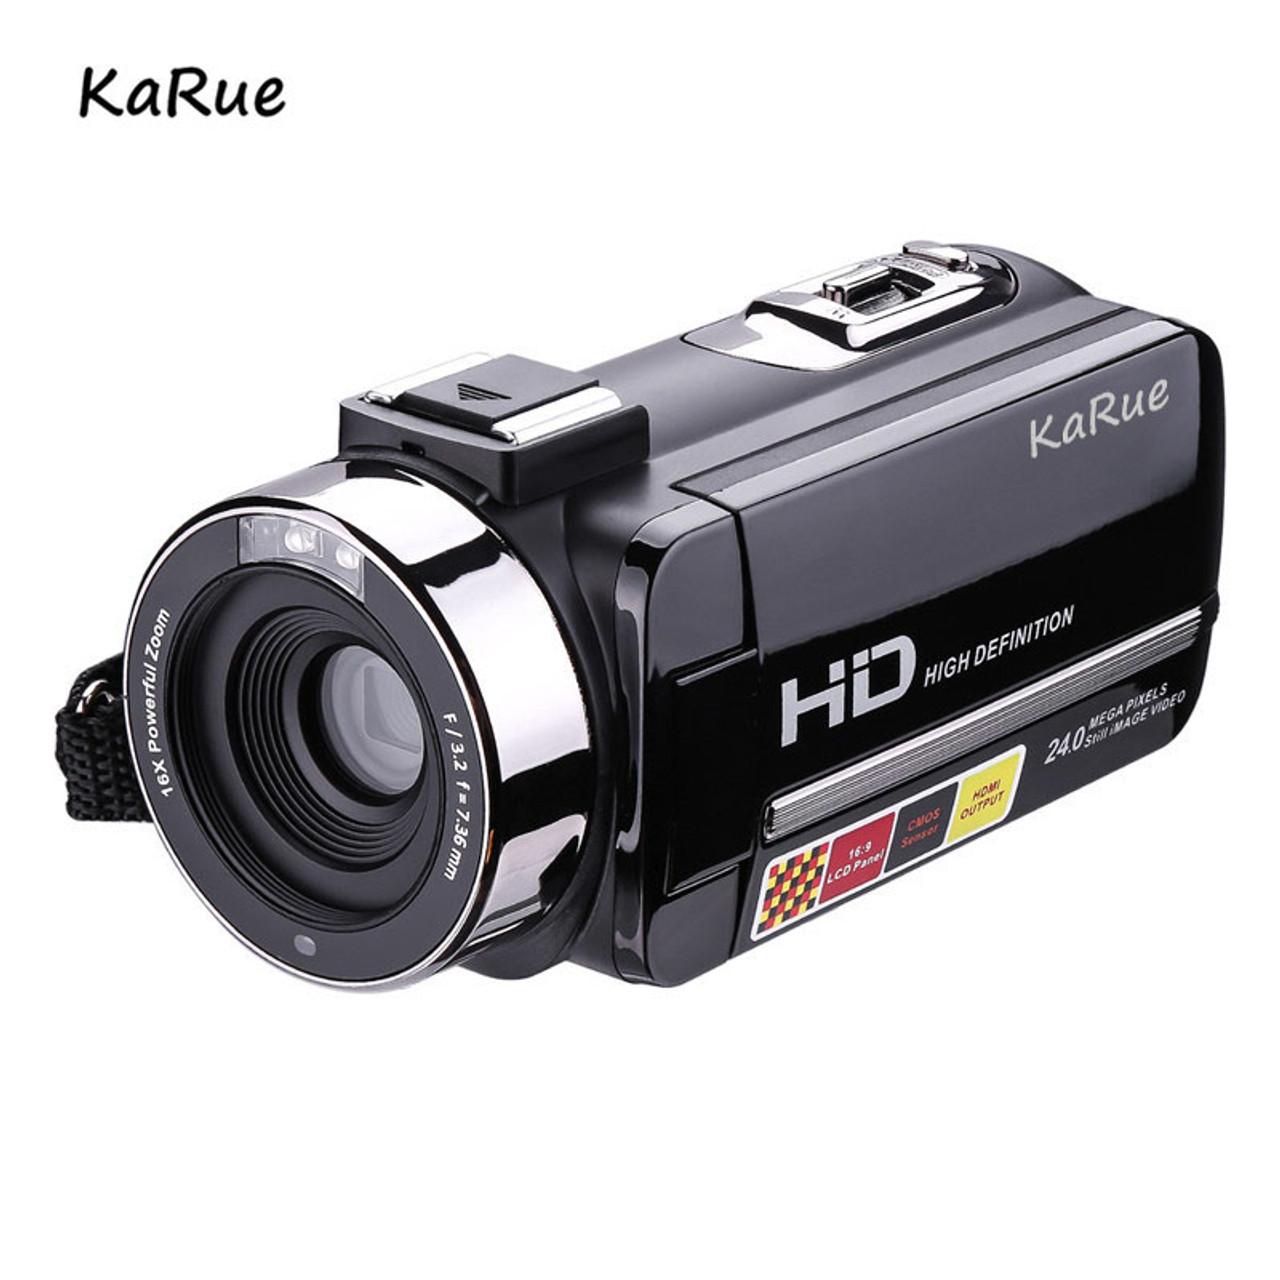 KaRue Digital Photo Camera with Mic and Remote HD Digital Video Camera  Camcorder 16x Digital Zoom DV 3 0